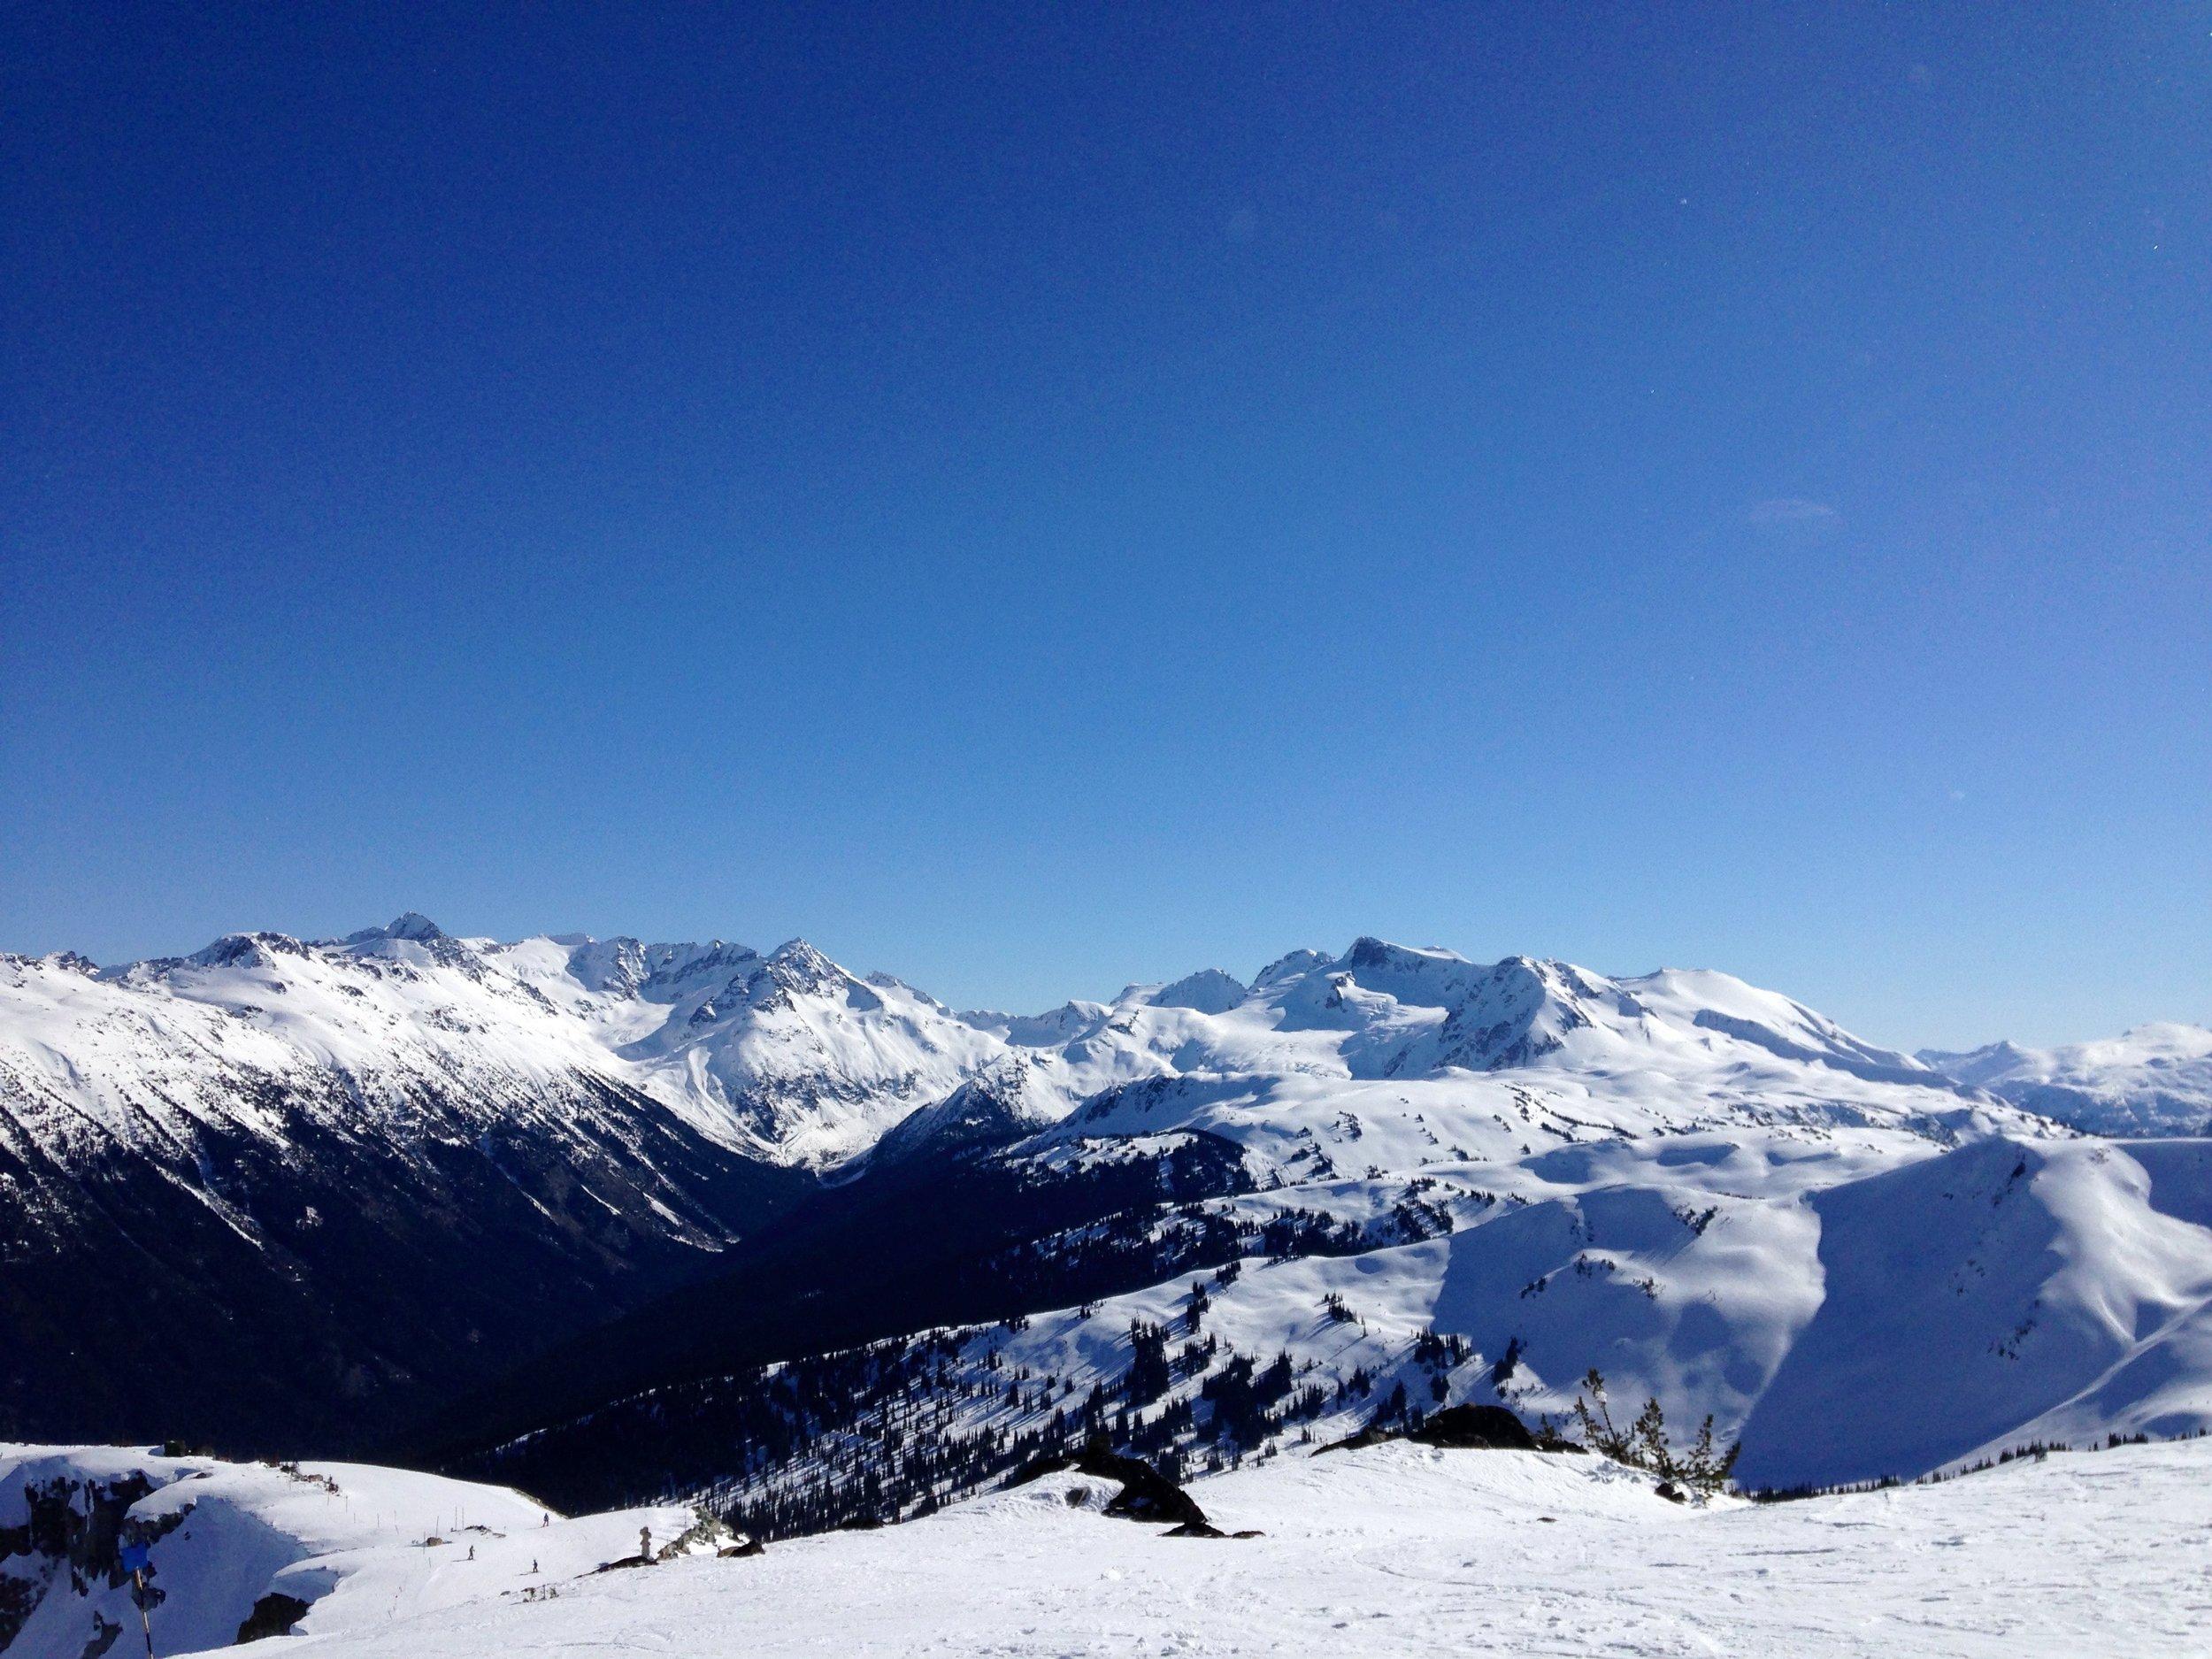 A bluebird day on the mountain